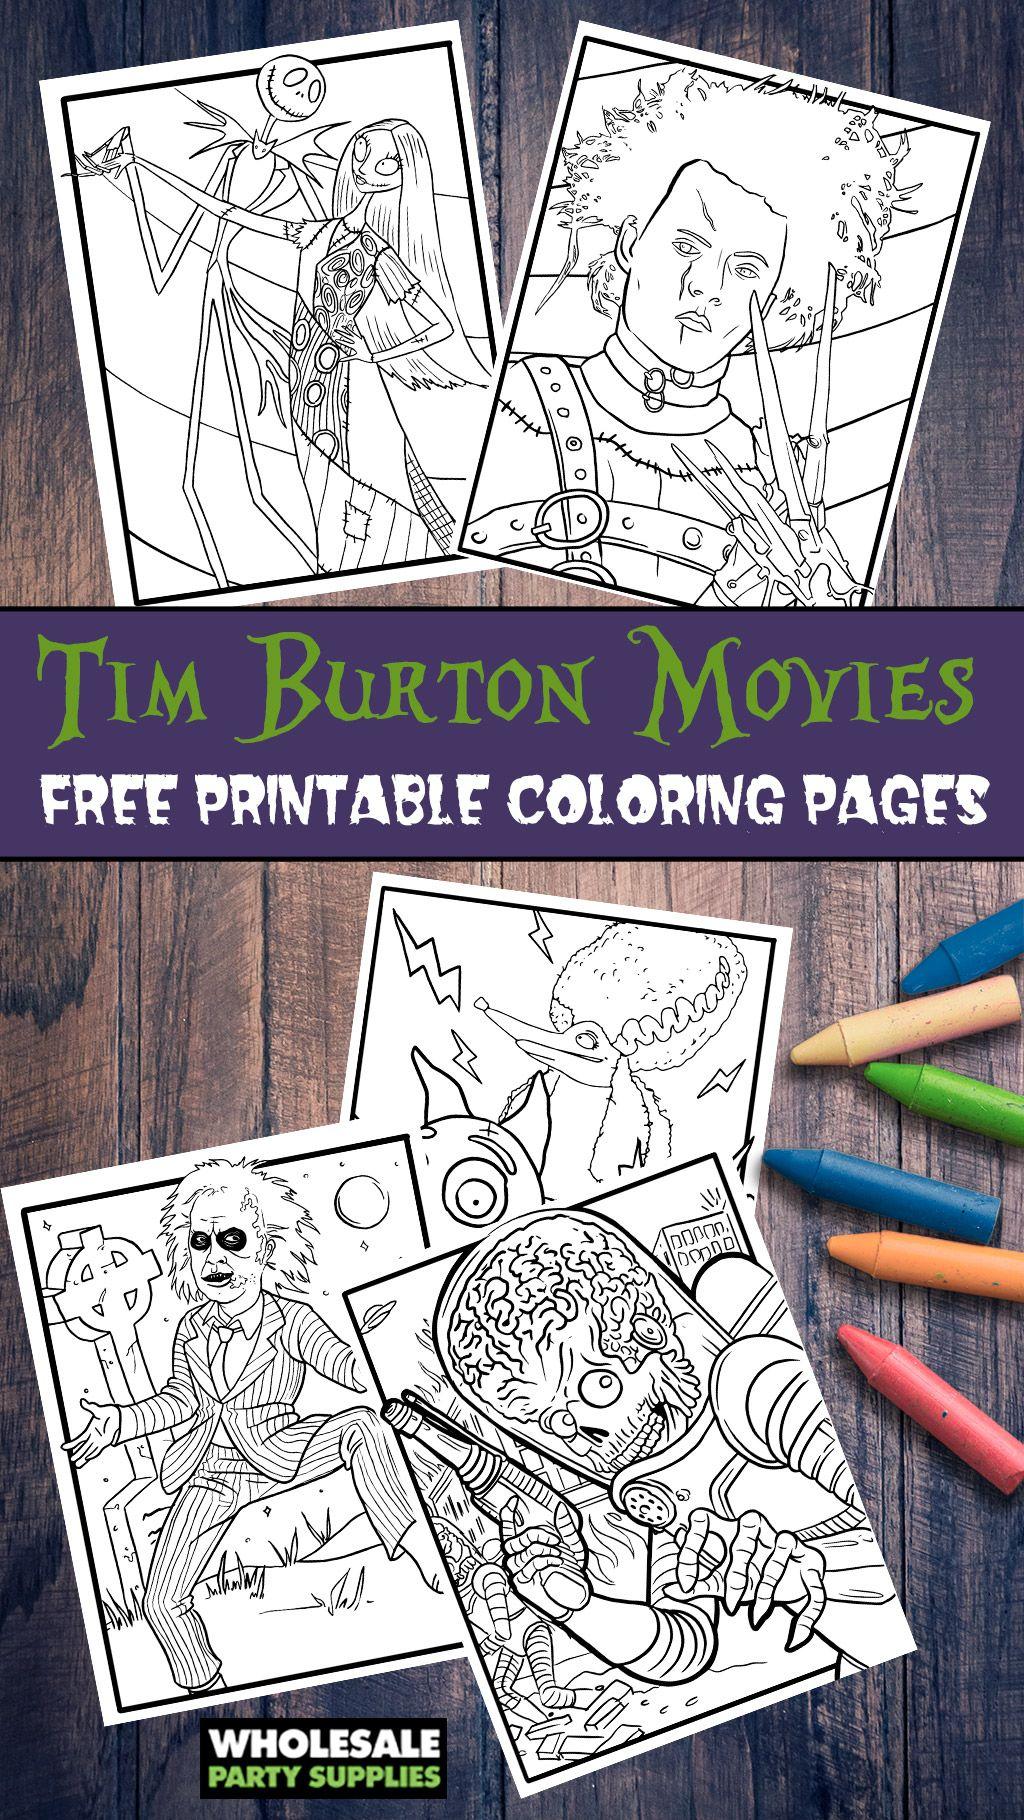 Tim Burton FREE Printable Coloring Pages   Printable ...